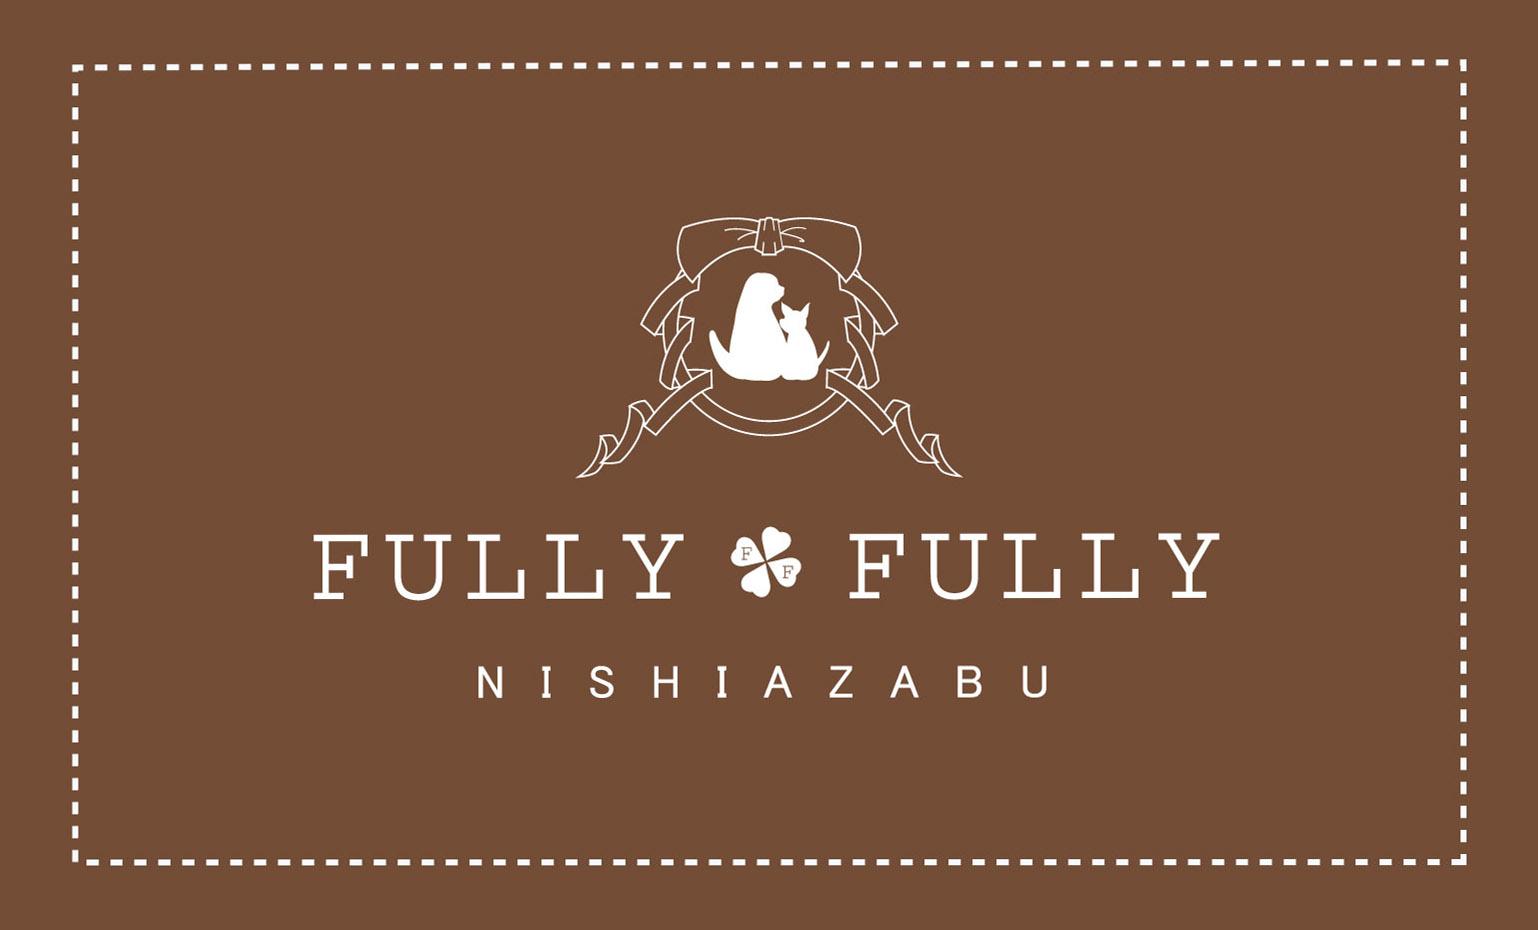 FULLY FULLY ロゴ(青)